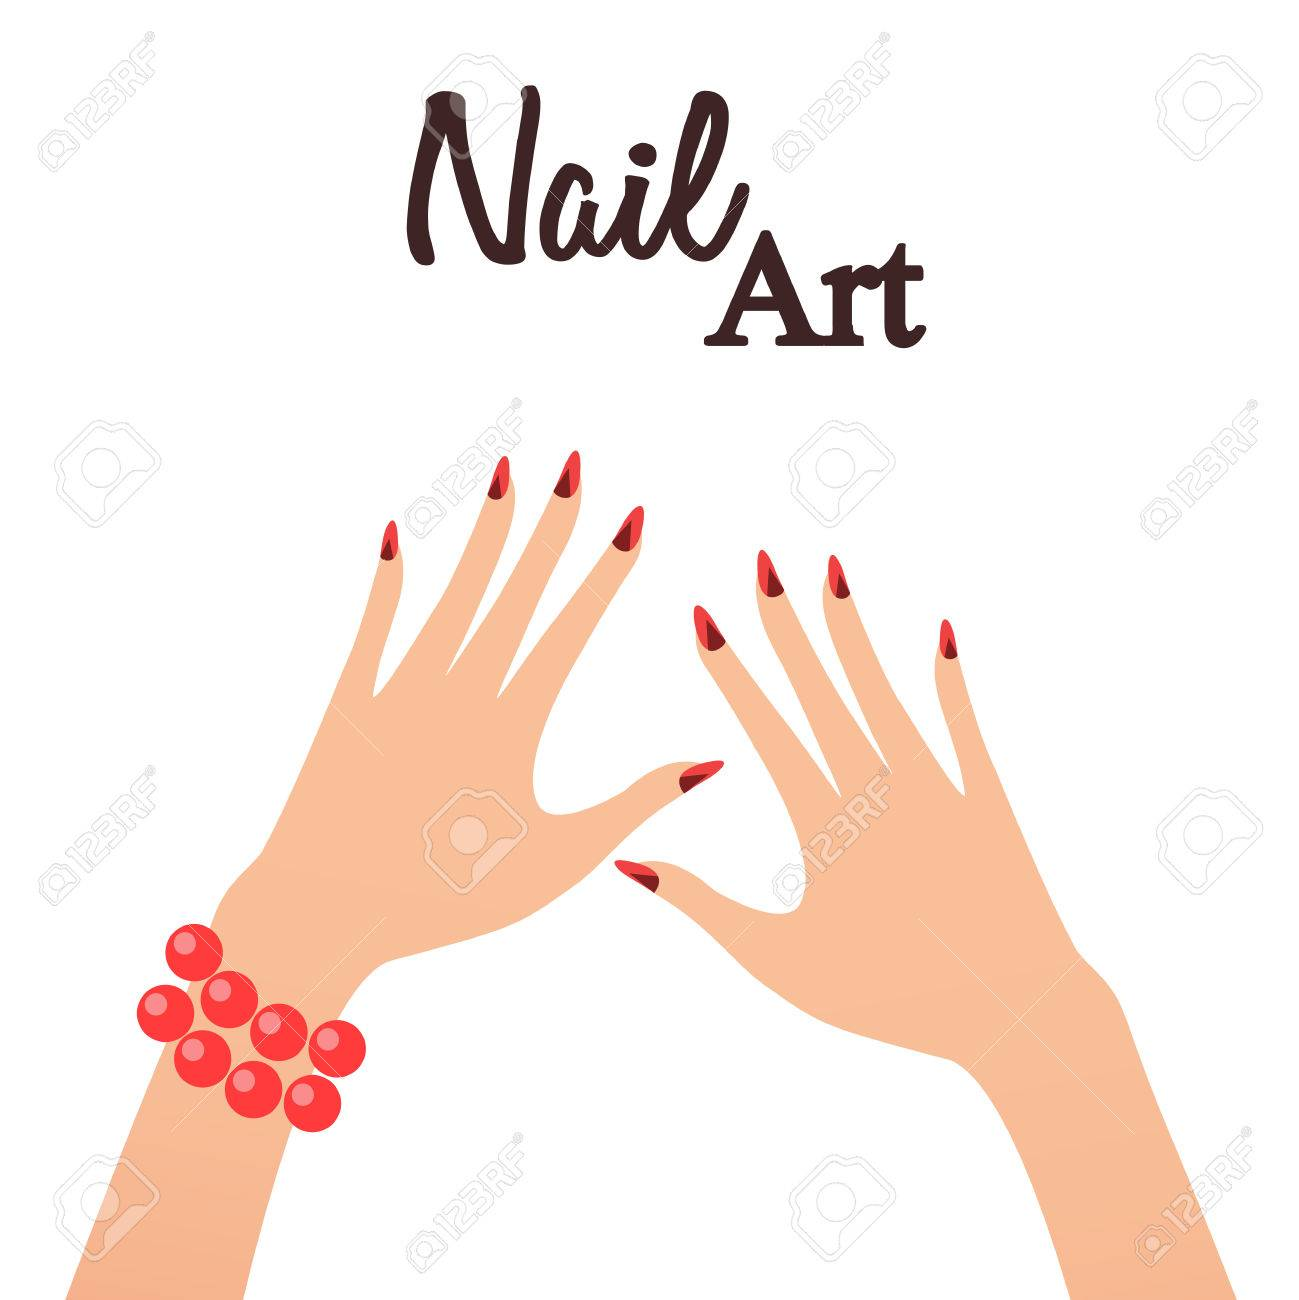 Nail Art Studio. Vector Illustration Royalty Free Cliparts, Vectors ...